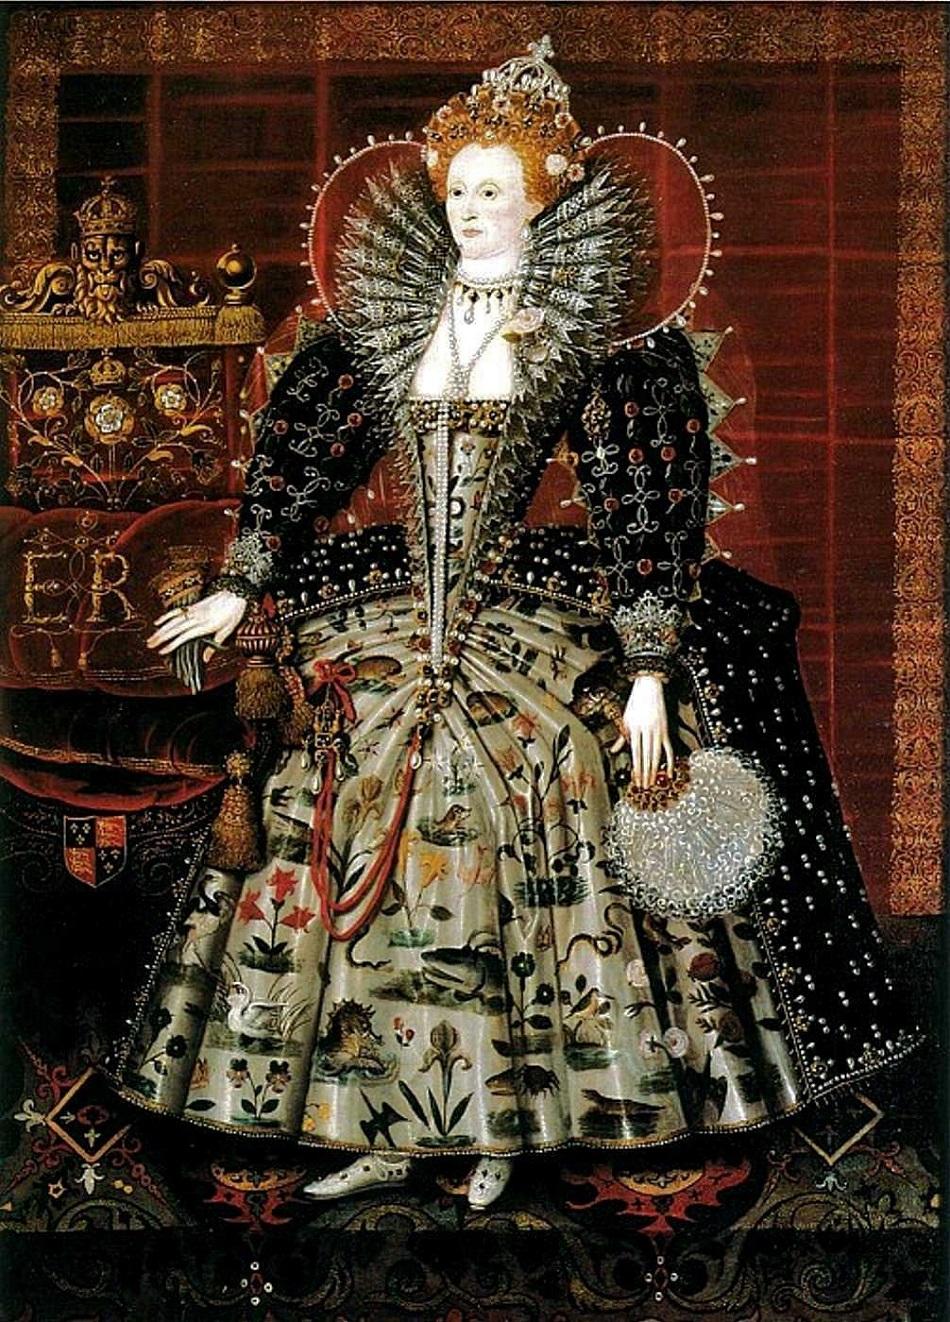 1592-99 Queen Elizabeth I 1533-1603  The Hardwick Portrait by Nicholas Hilliard and his workshop. (2).jpg